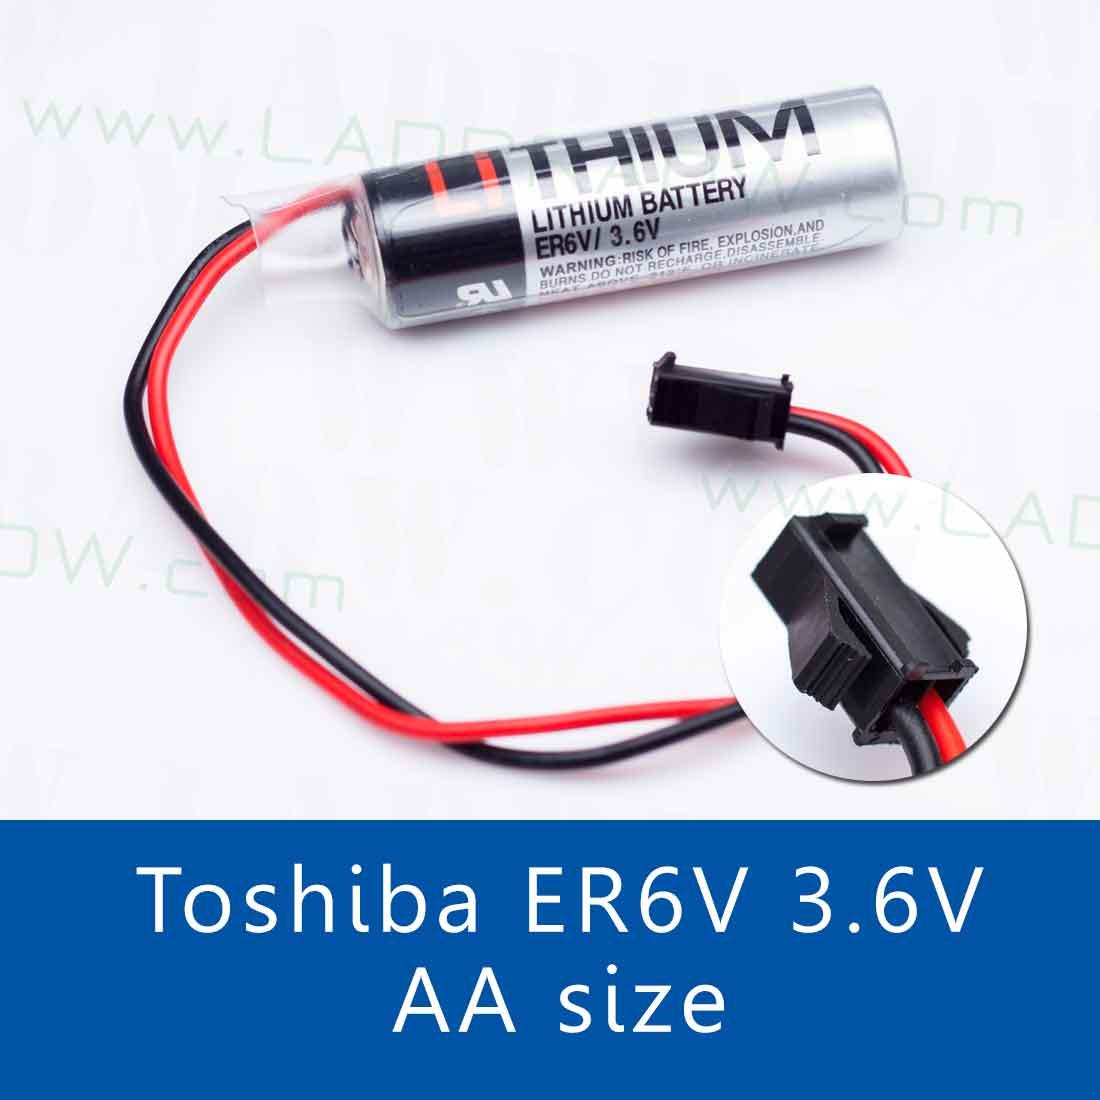 TOSHIBA ER6V / 3.6V Lithium Battery แบตเตอรี่ลิเธียม พร้อมสาย